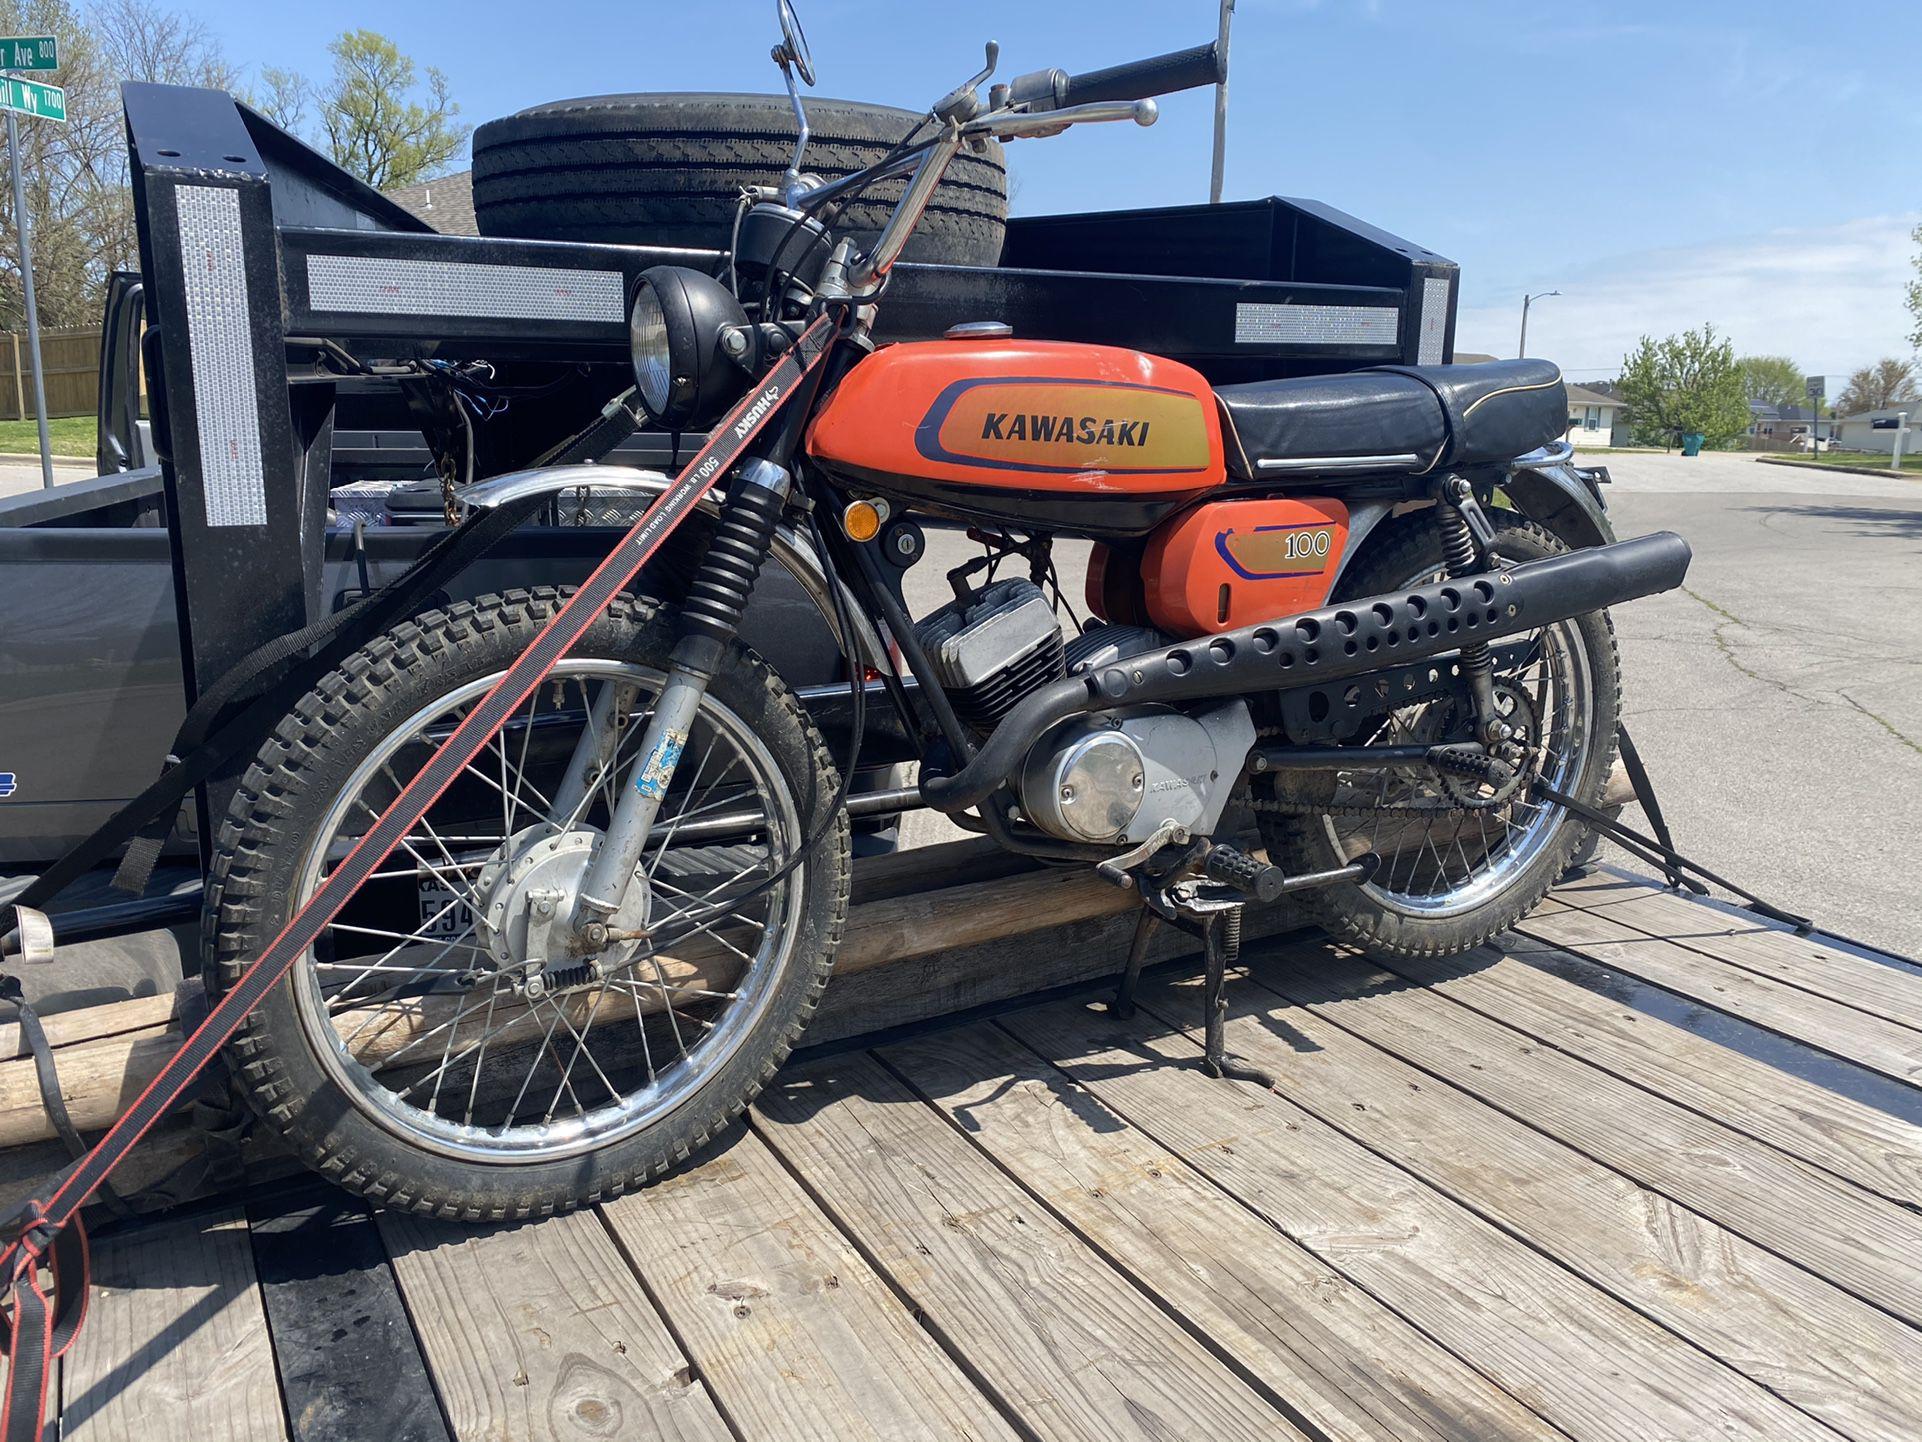 1971 kawasaki 100 cc G3TR-A